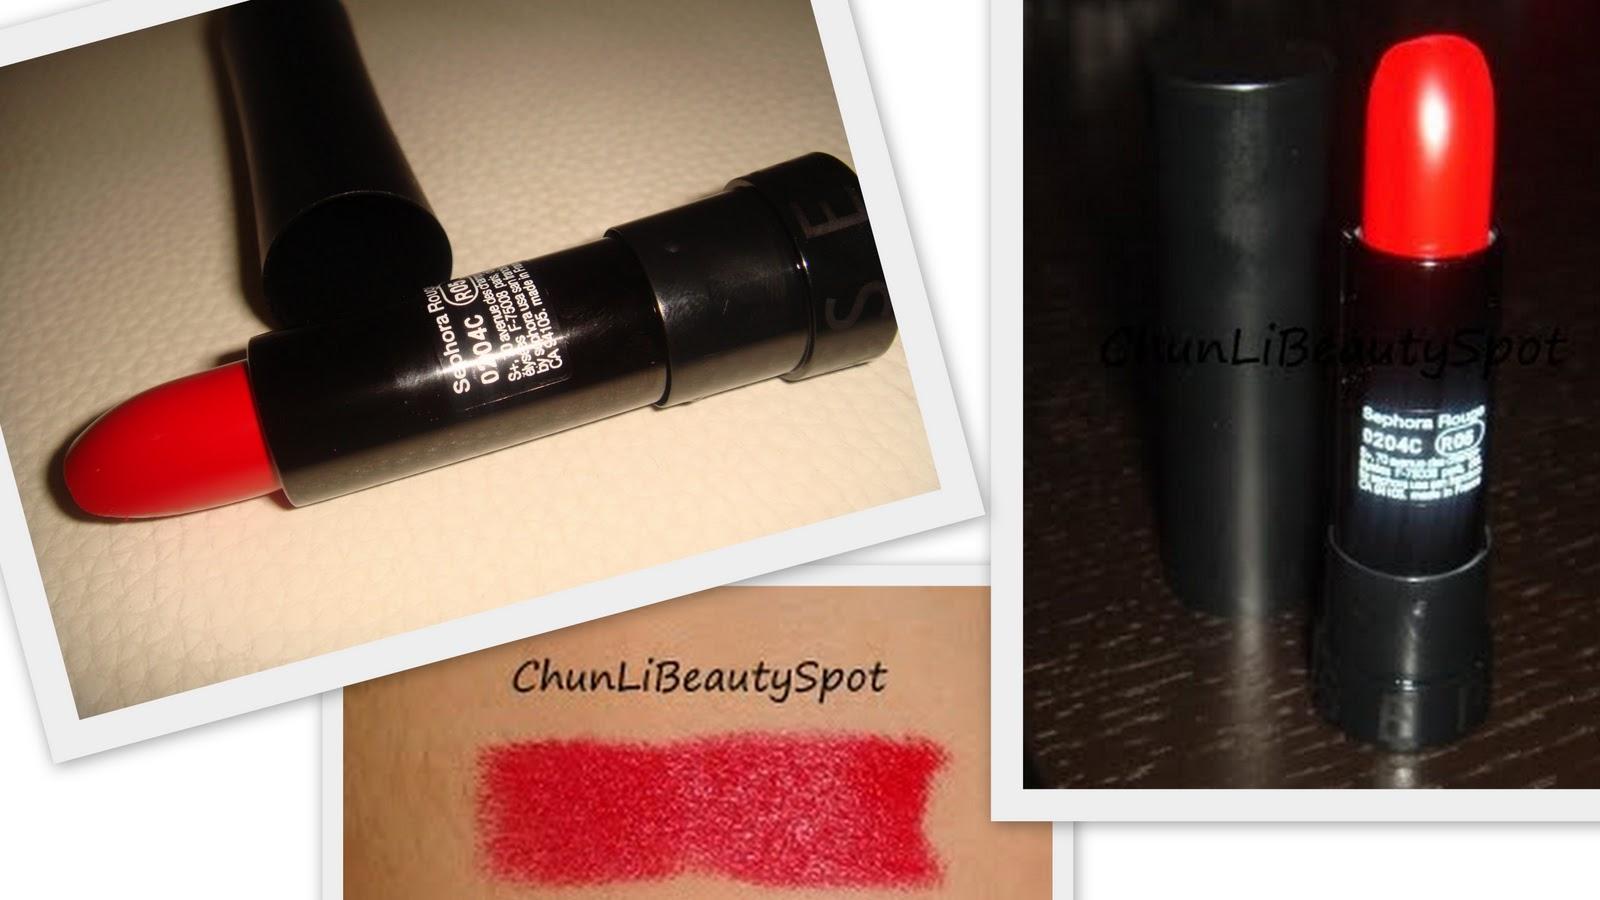 Sephora Hot Tango 05 Kırmızı Ruj Chunlibeauty